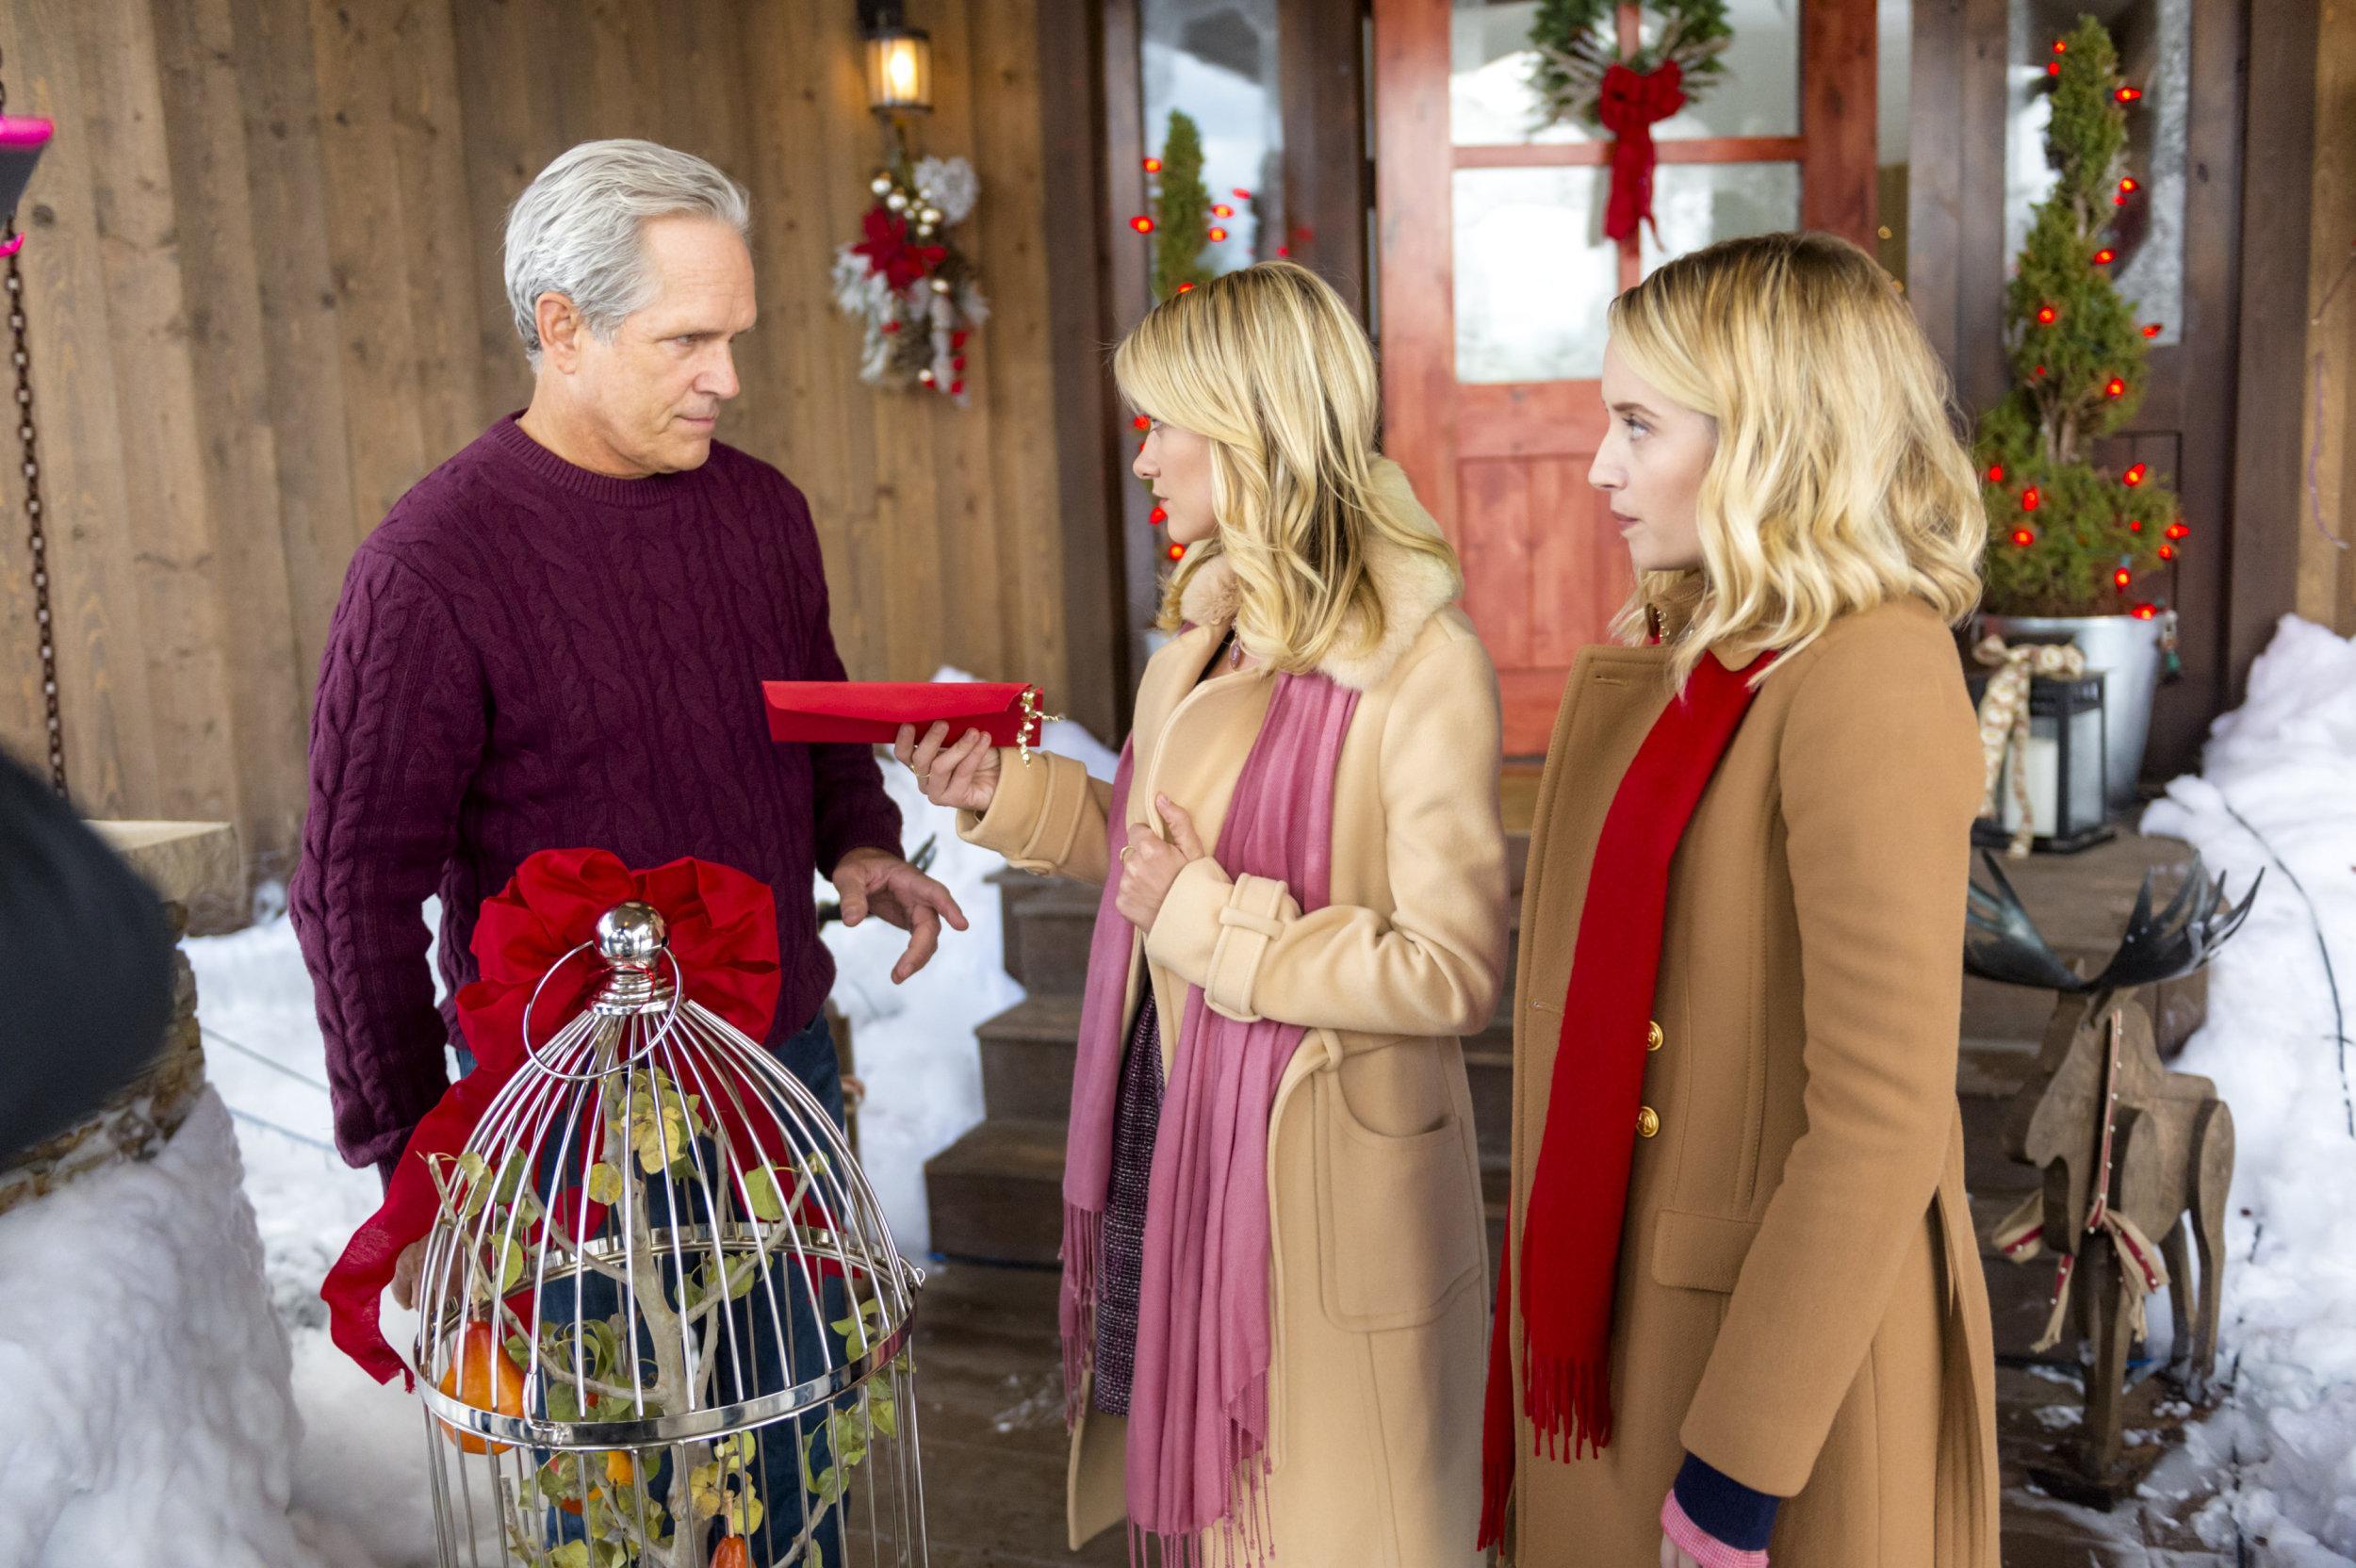 Christmas In Homestead Trailer. Christmas. DIY Home Plans Database